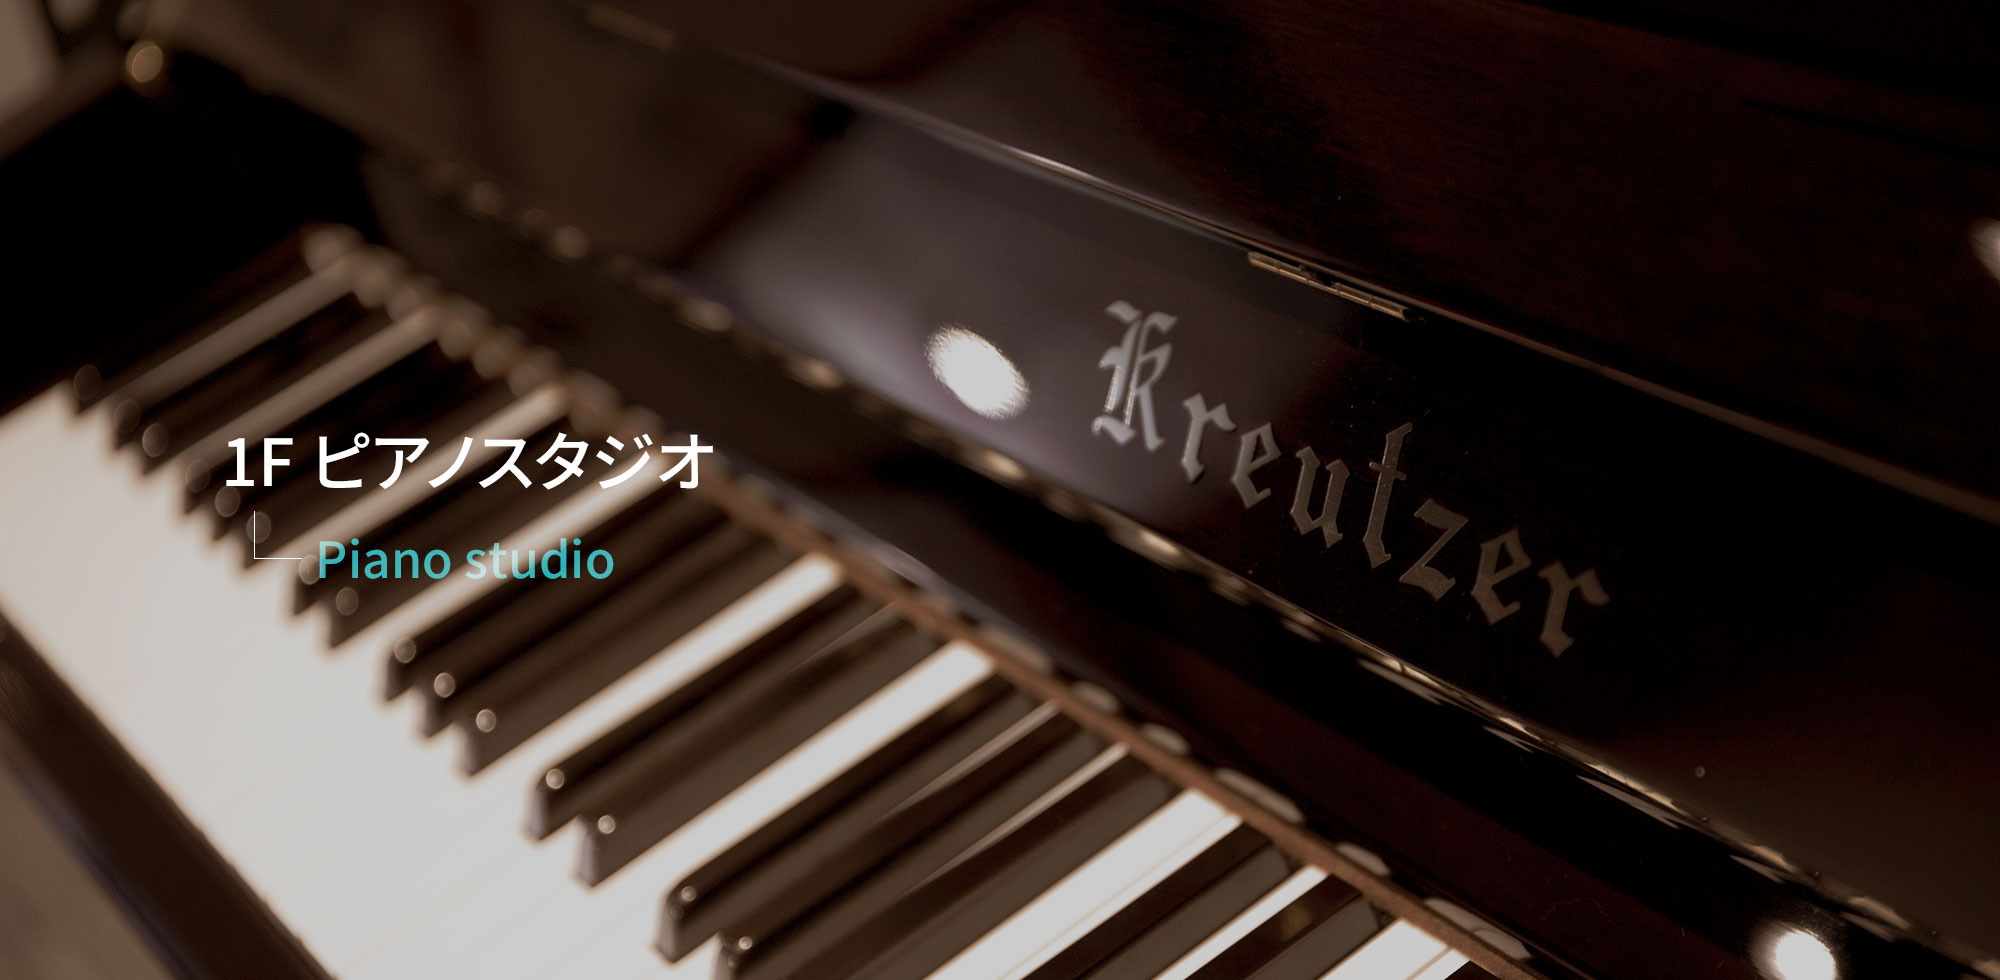 1Fピアノスタジオ